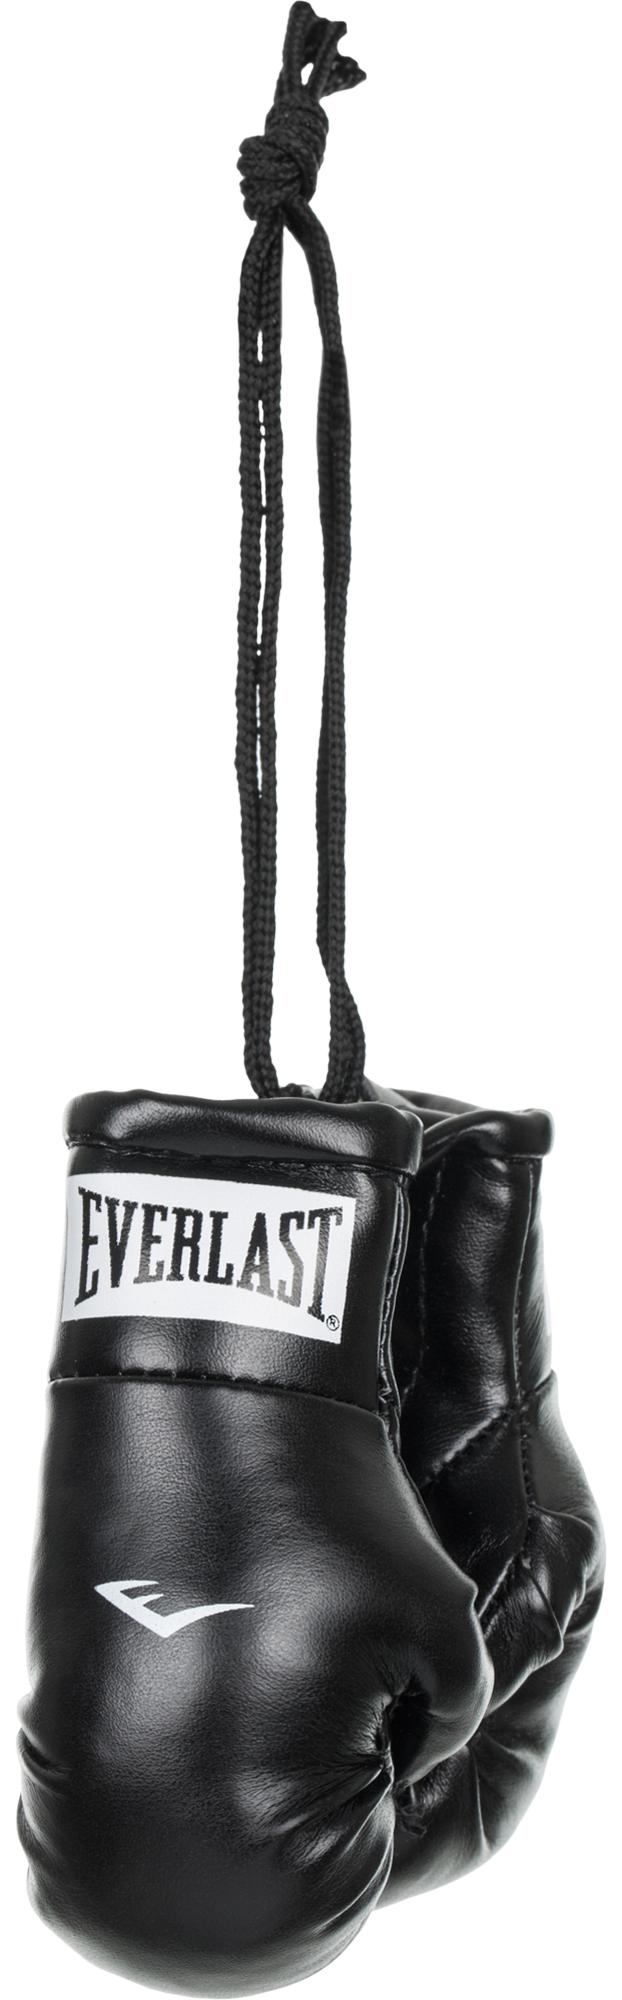 Everlast Брелок Everlast точная копия швейцарских часов